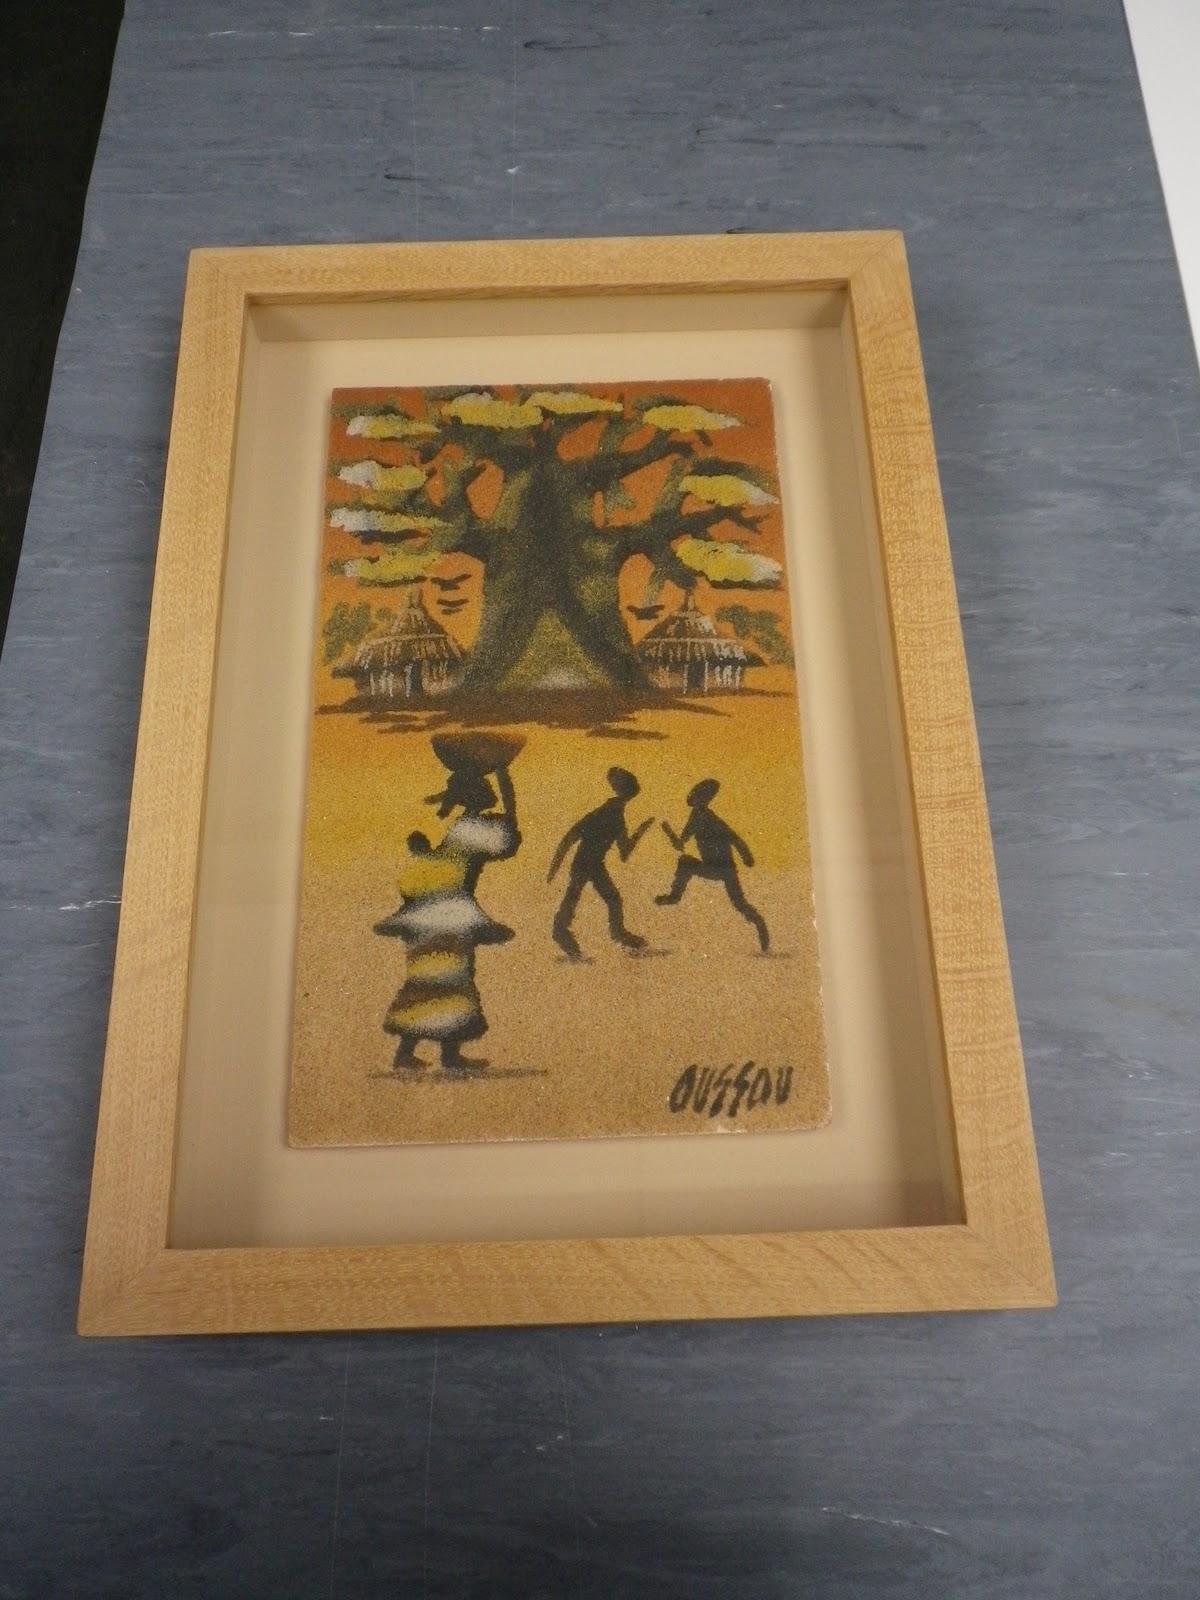 Framemaker: Framing holiday souvenirs